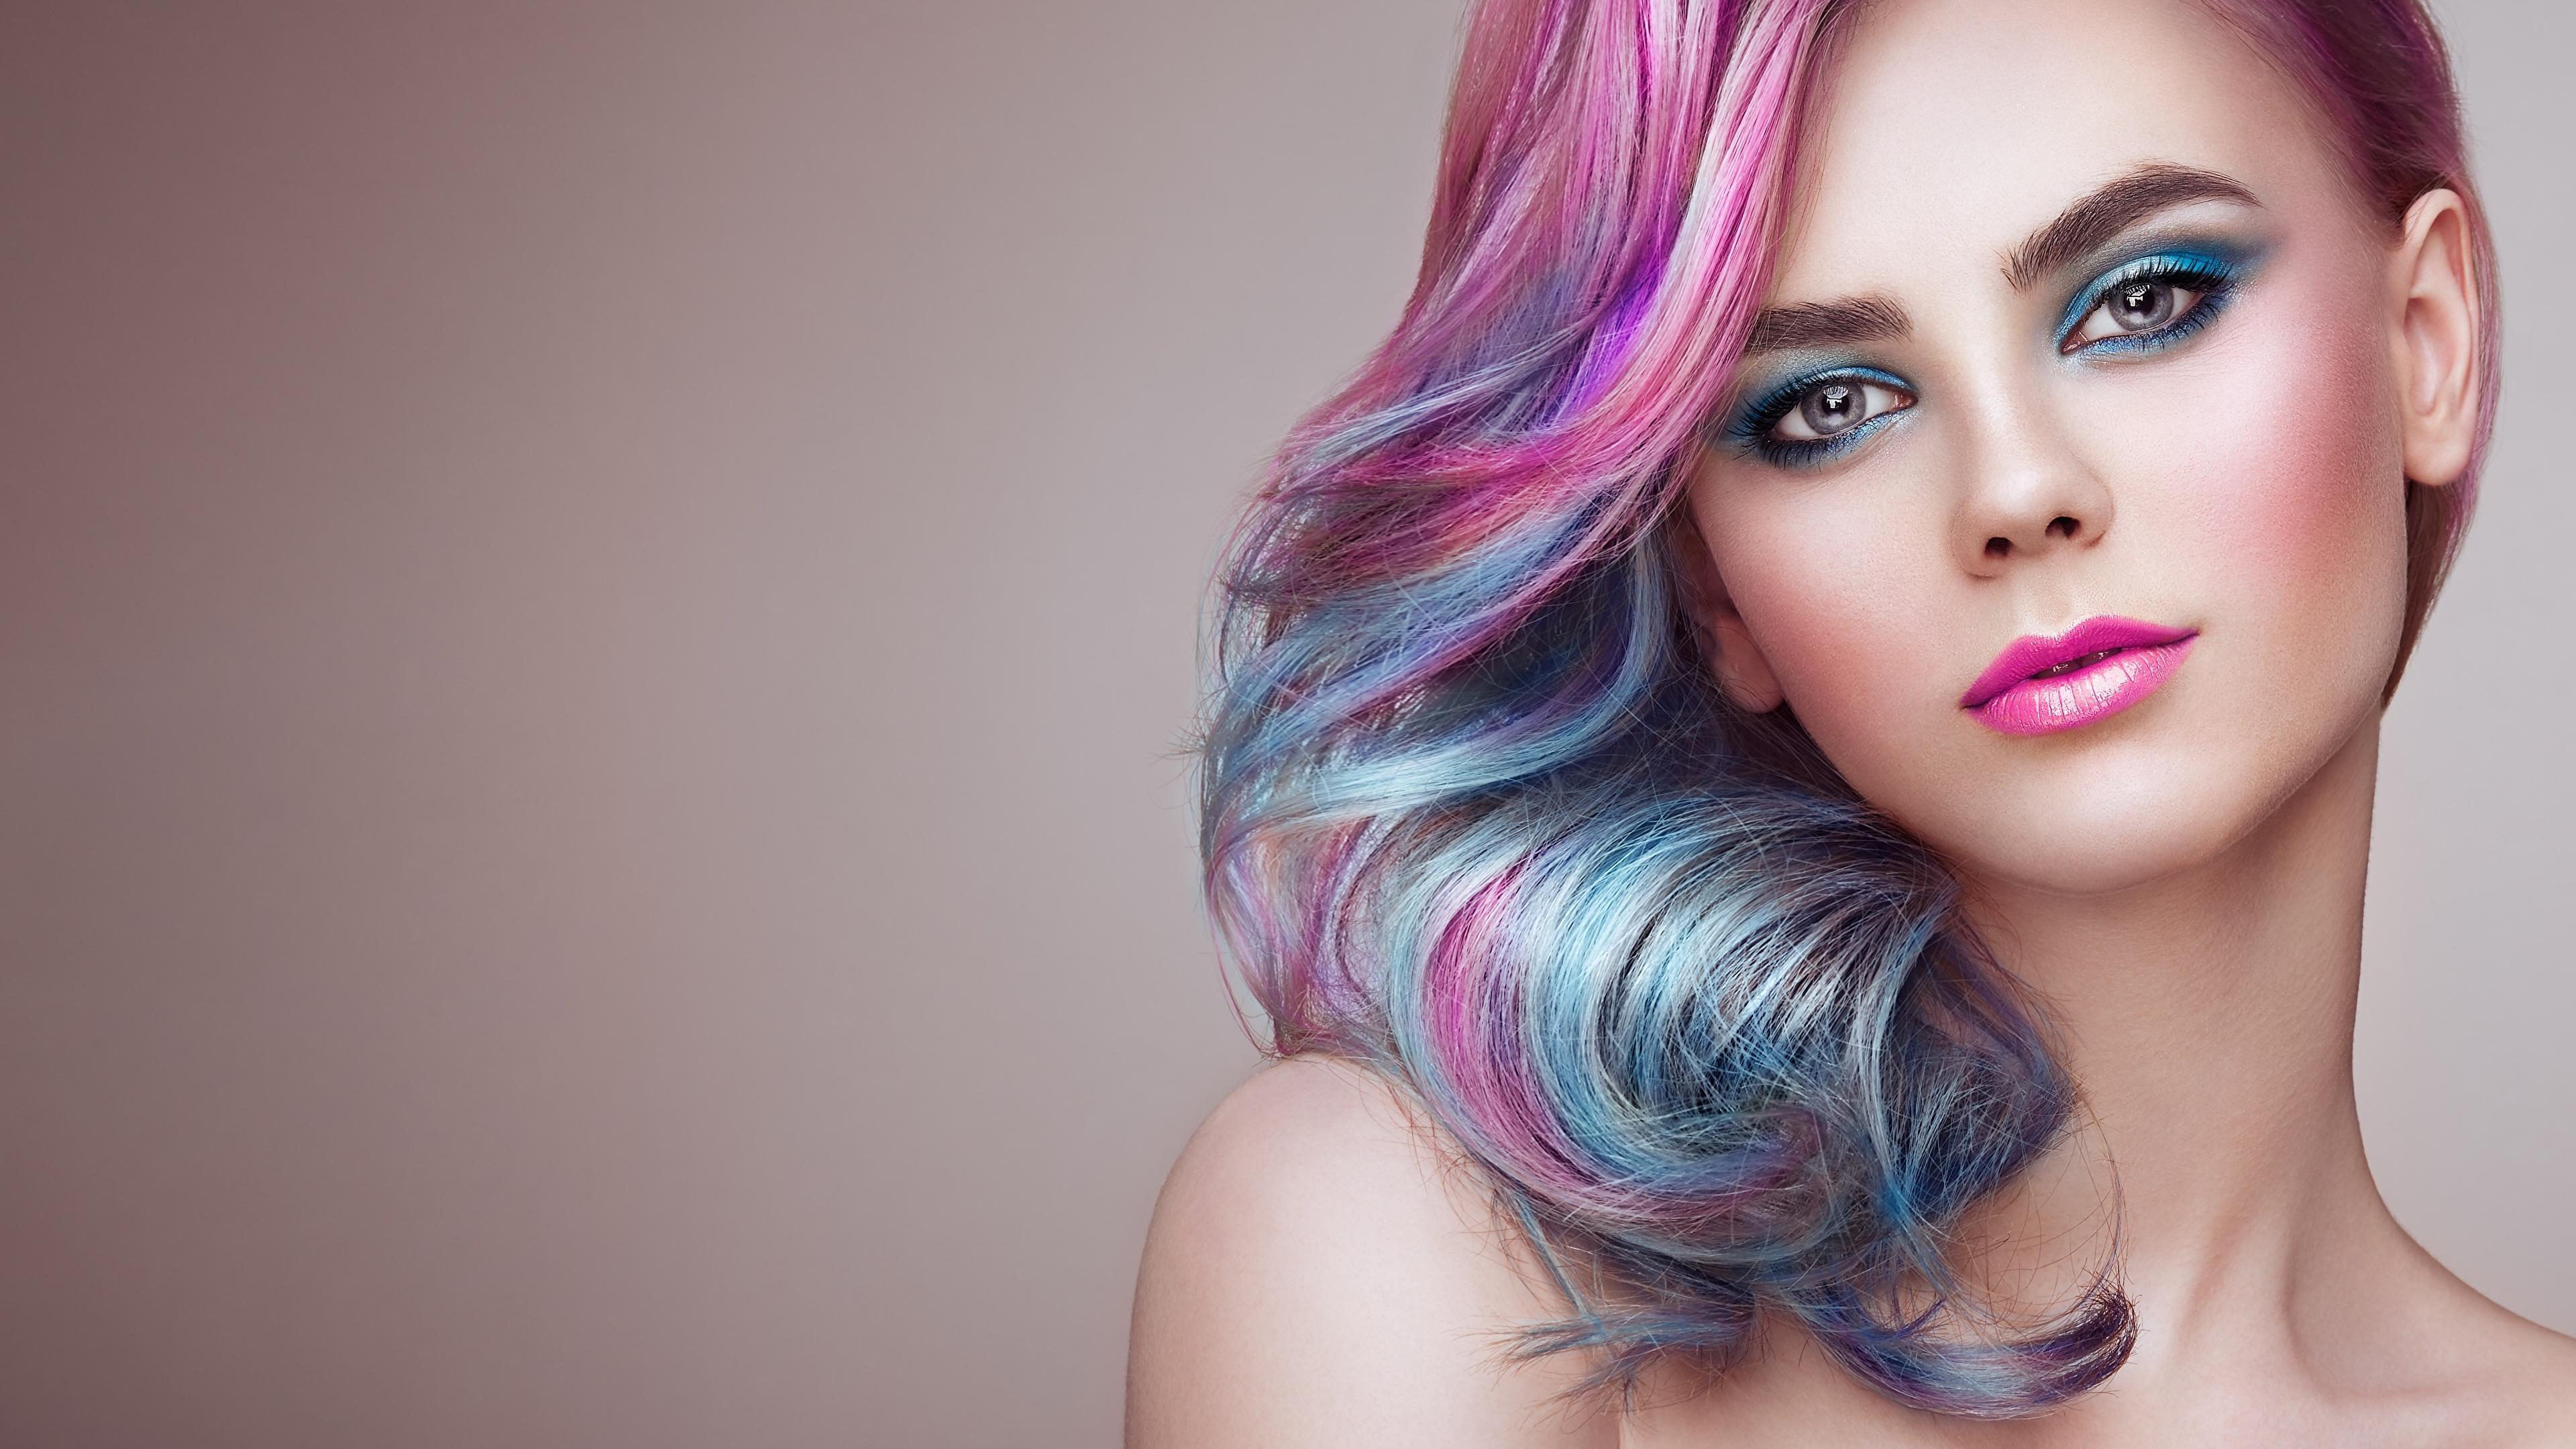 Desktop Wallpapers Makeup Oleg Gekman Hairstyle Hair Face 3840x2160